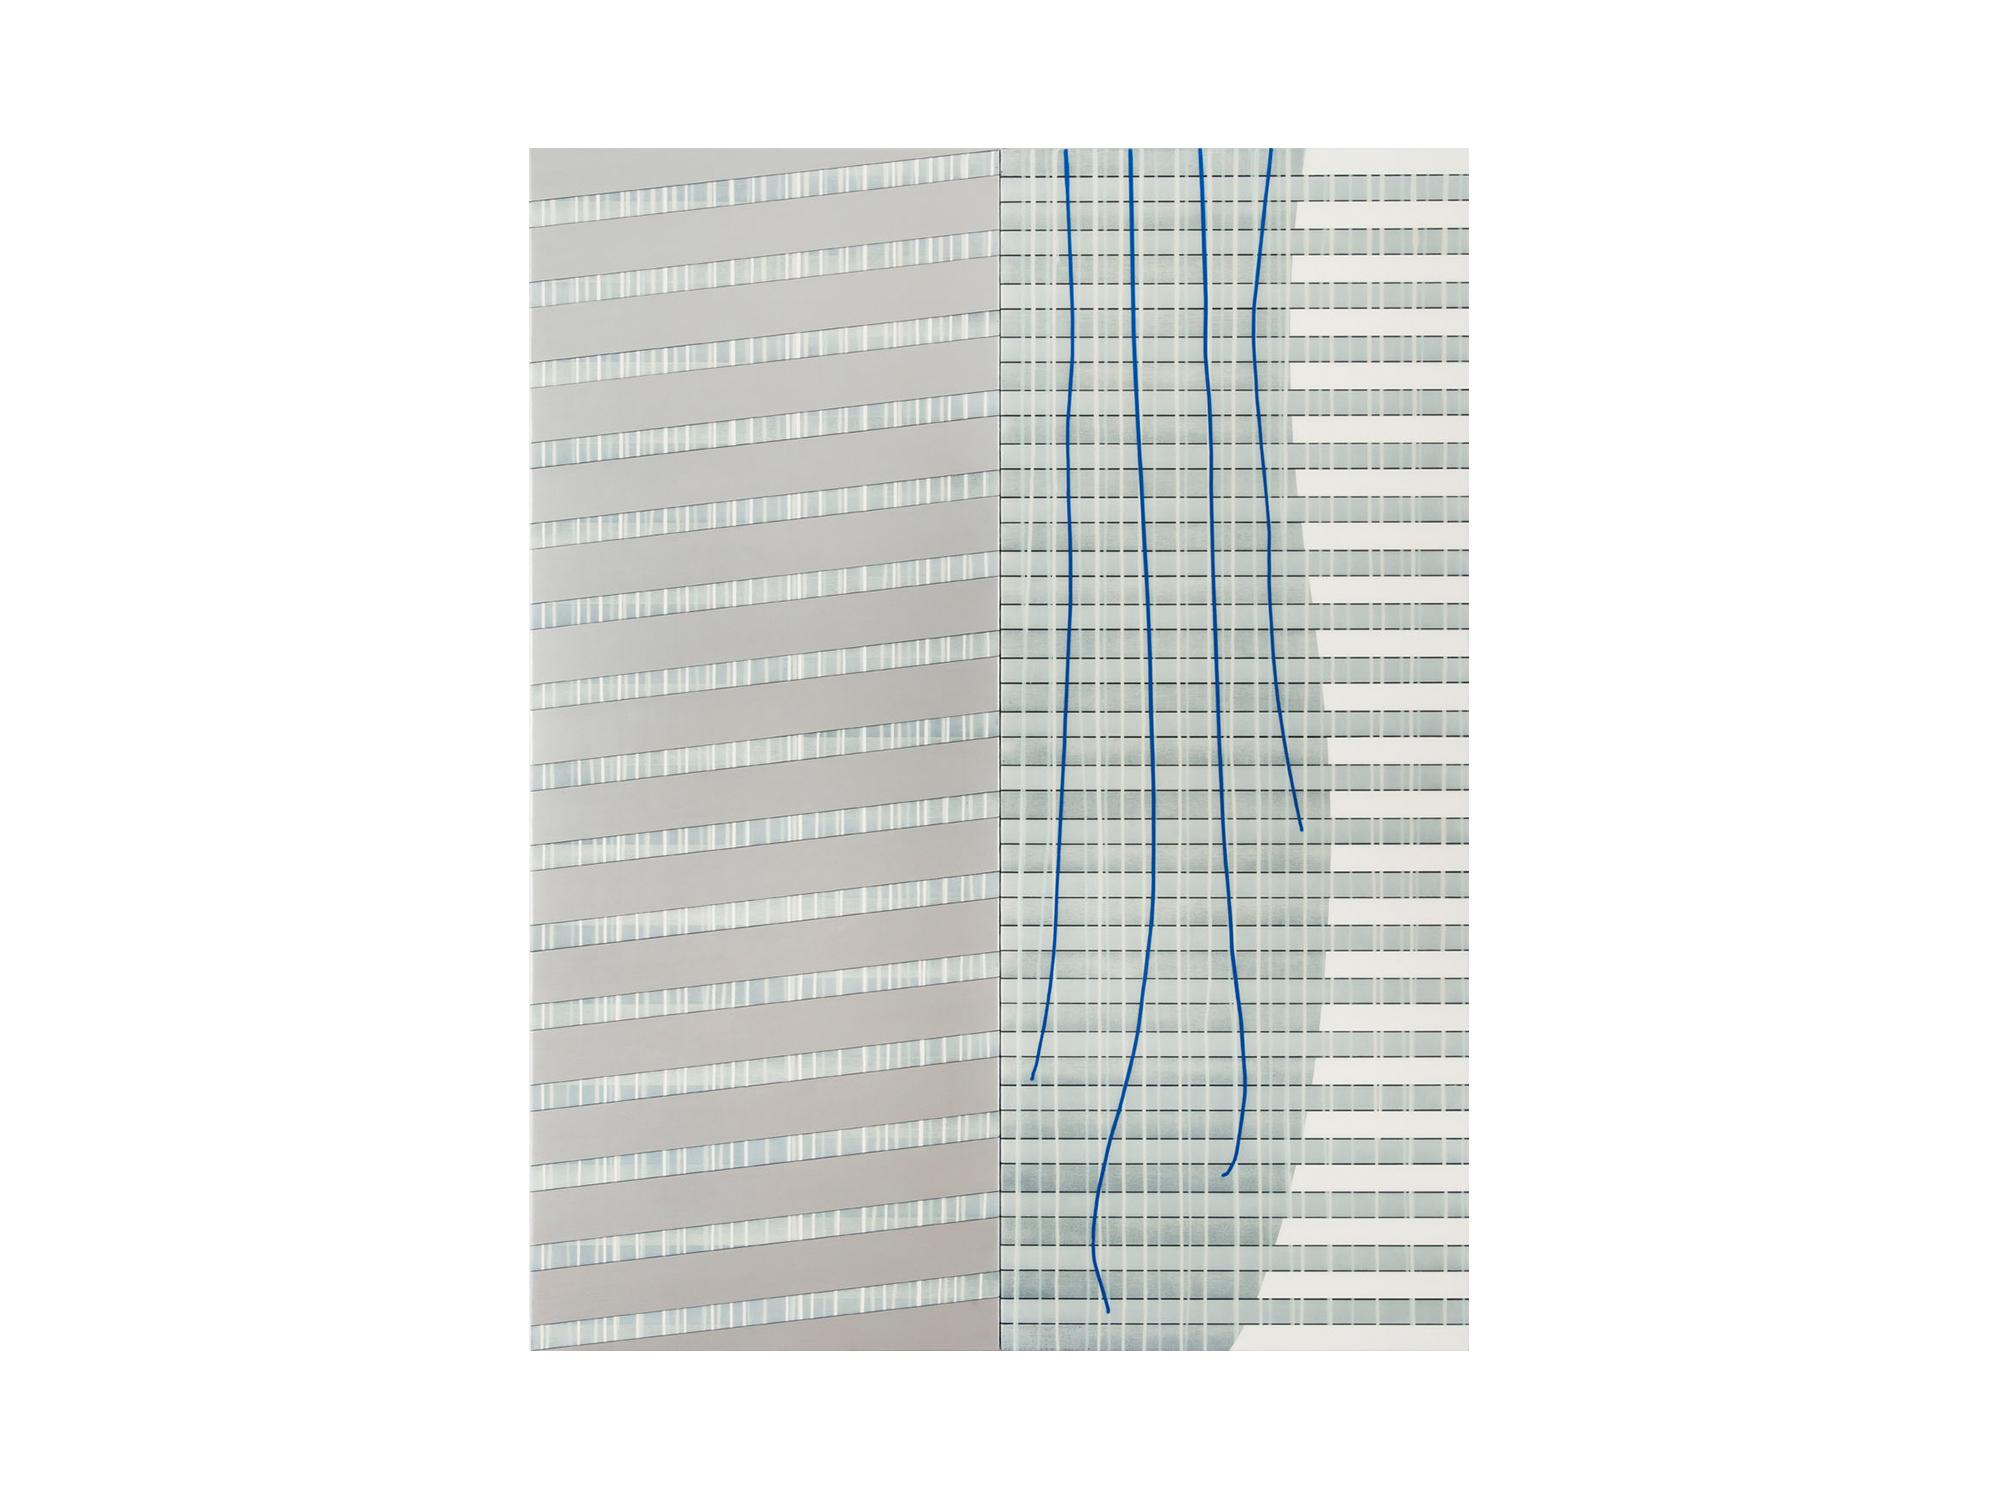 David Wallage    The Anatomy of Memory no. 2 , 2015 acrylic on linen on Dibond® 90 x 60cm   ARTIST BIO